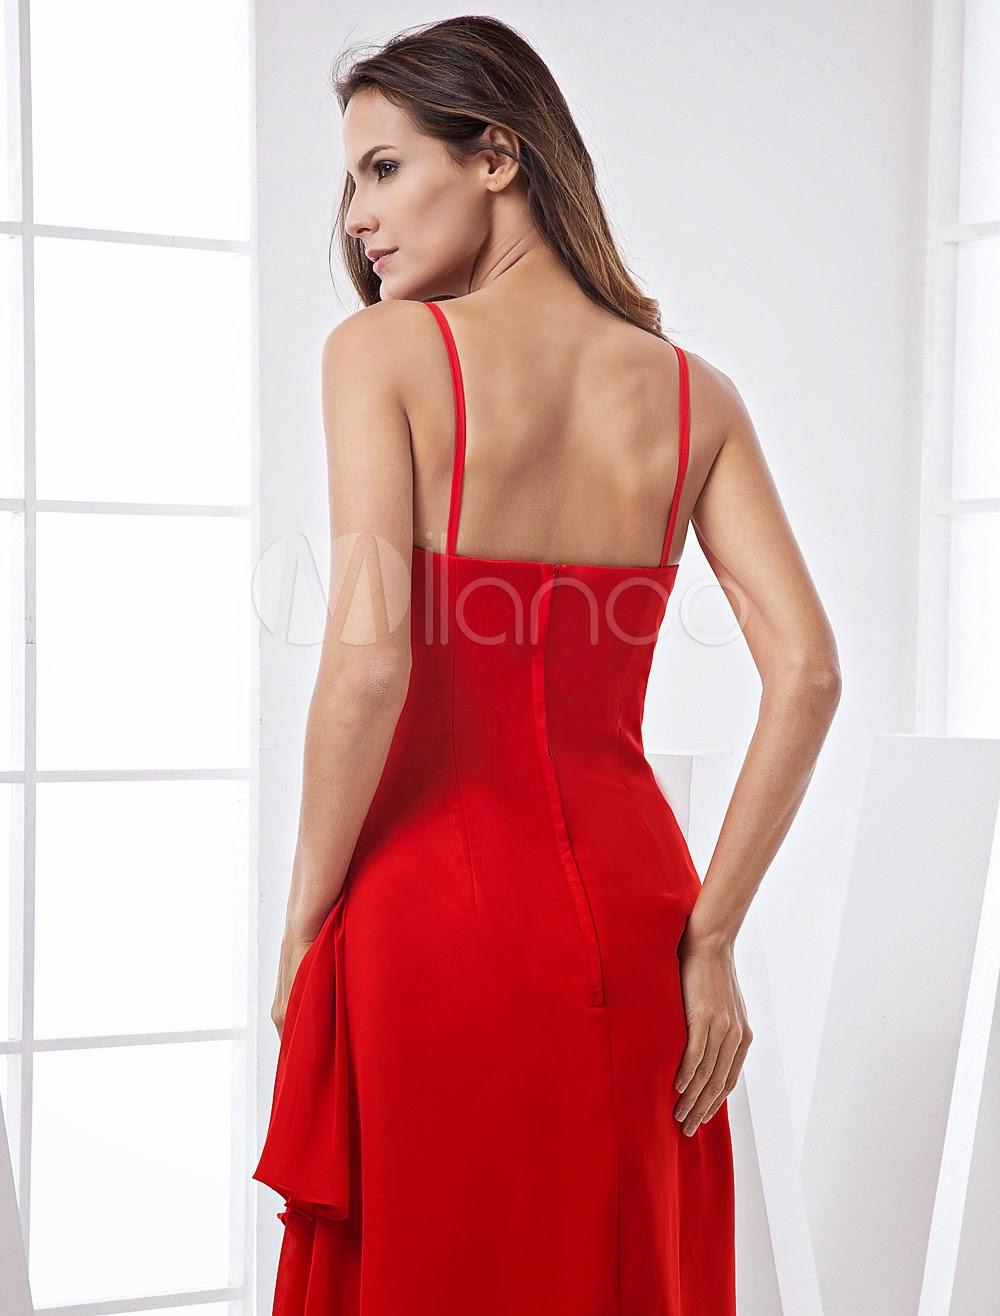 Robes sexy - Robe de soirée de retrouvaille de la mode au col-V faite en satin